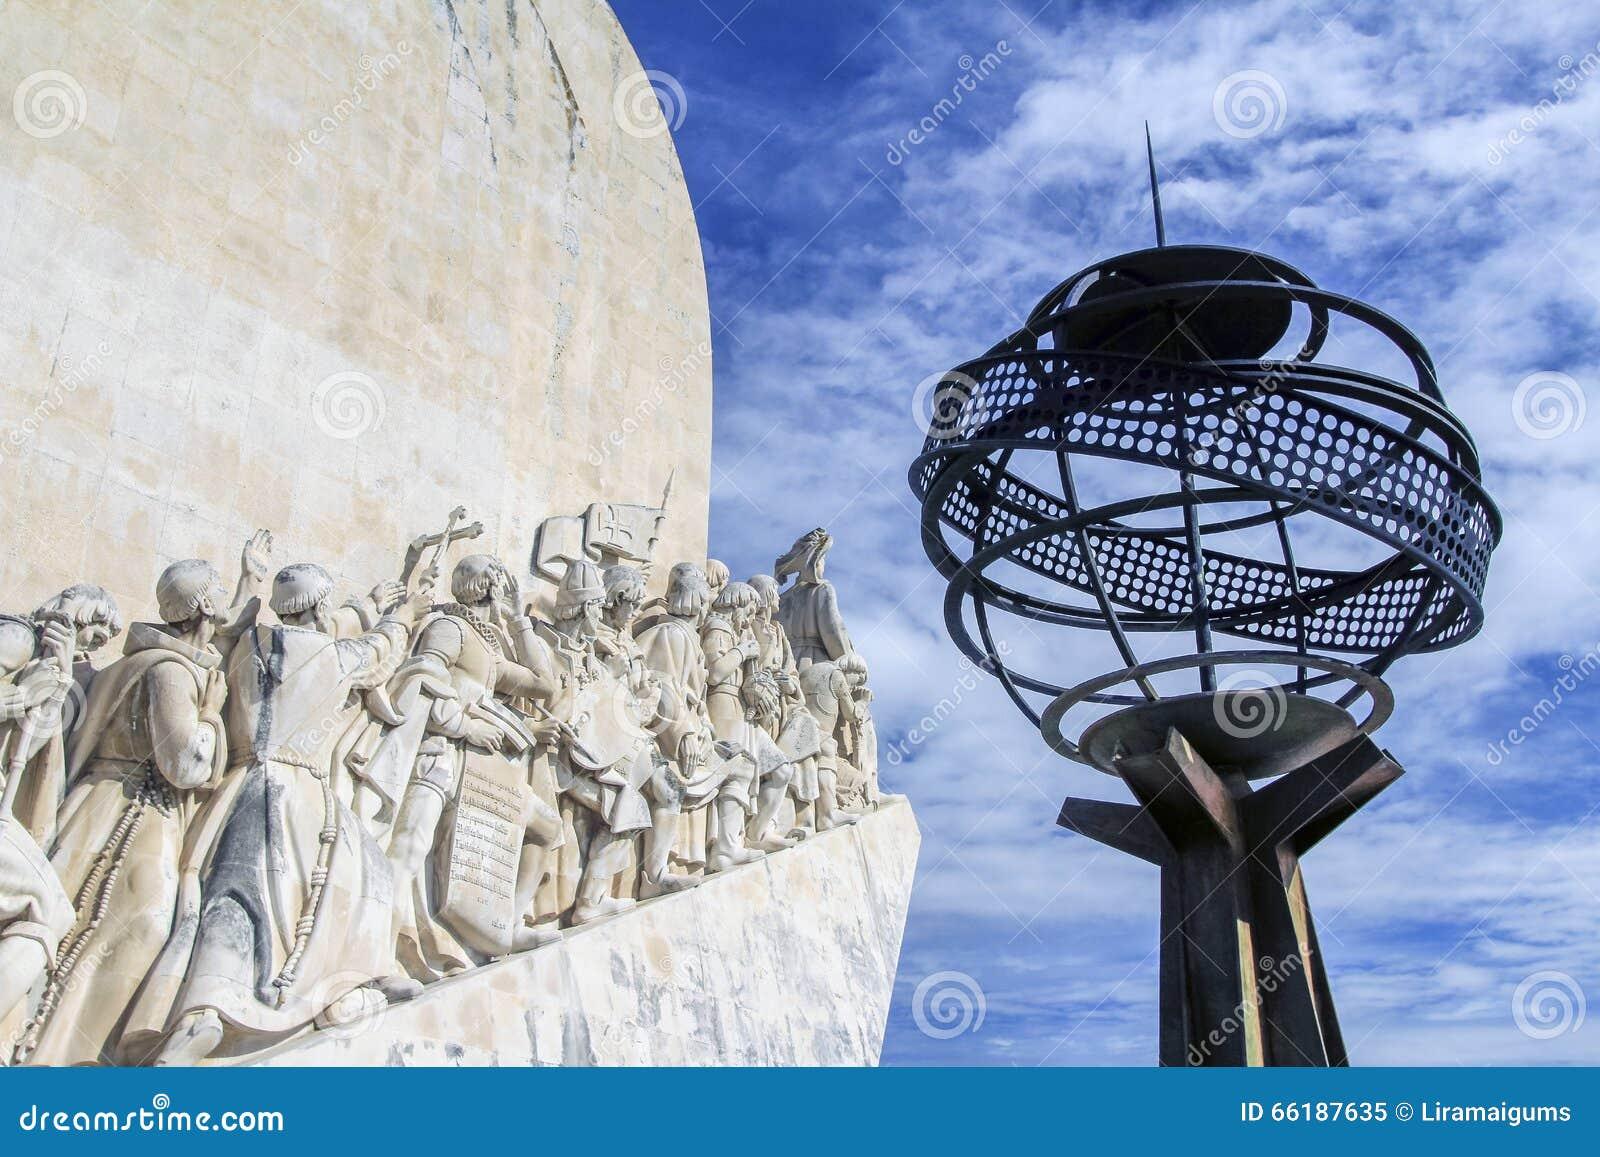 Fragmento do monumento às descobertas, Lisboa, Portugal